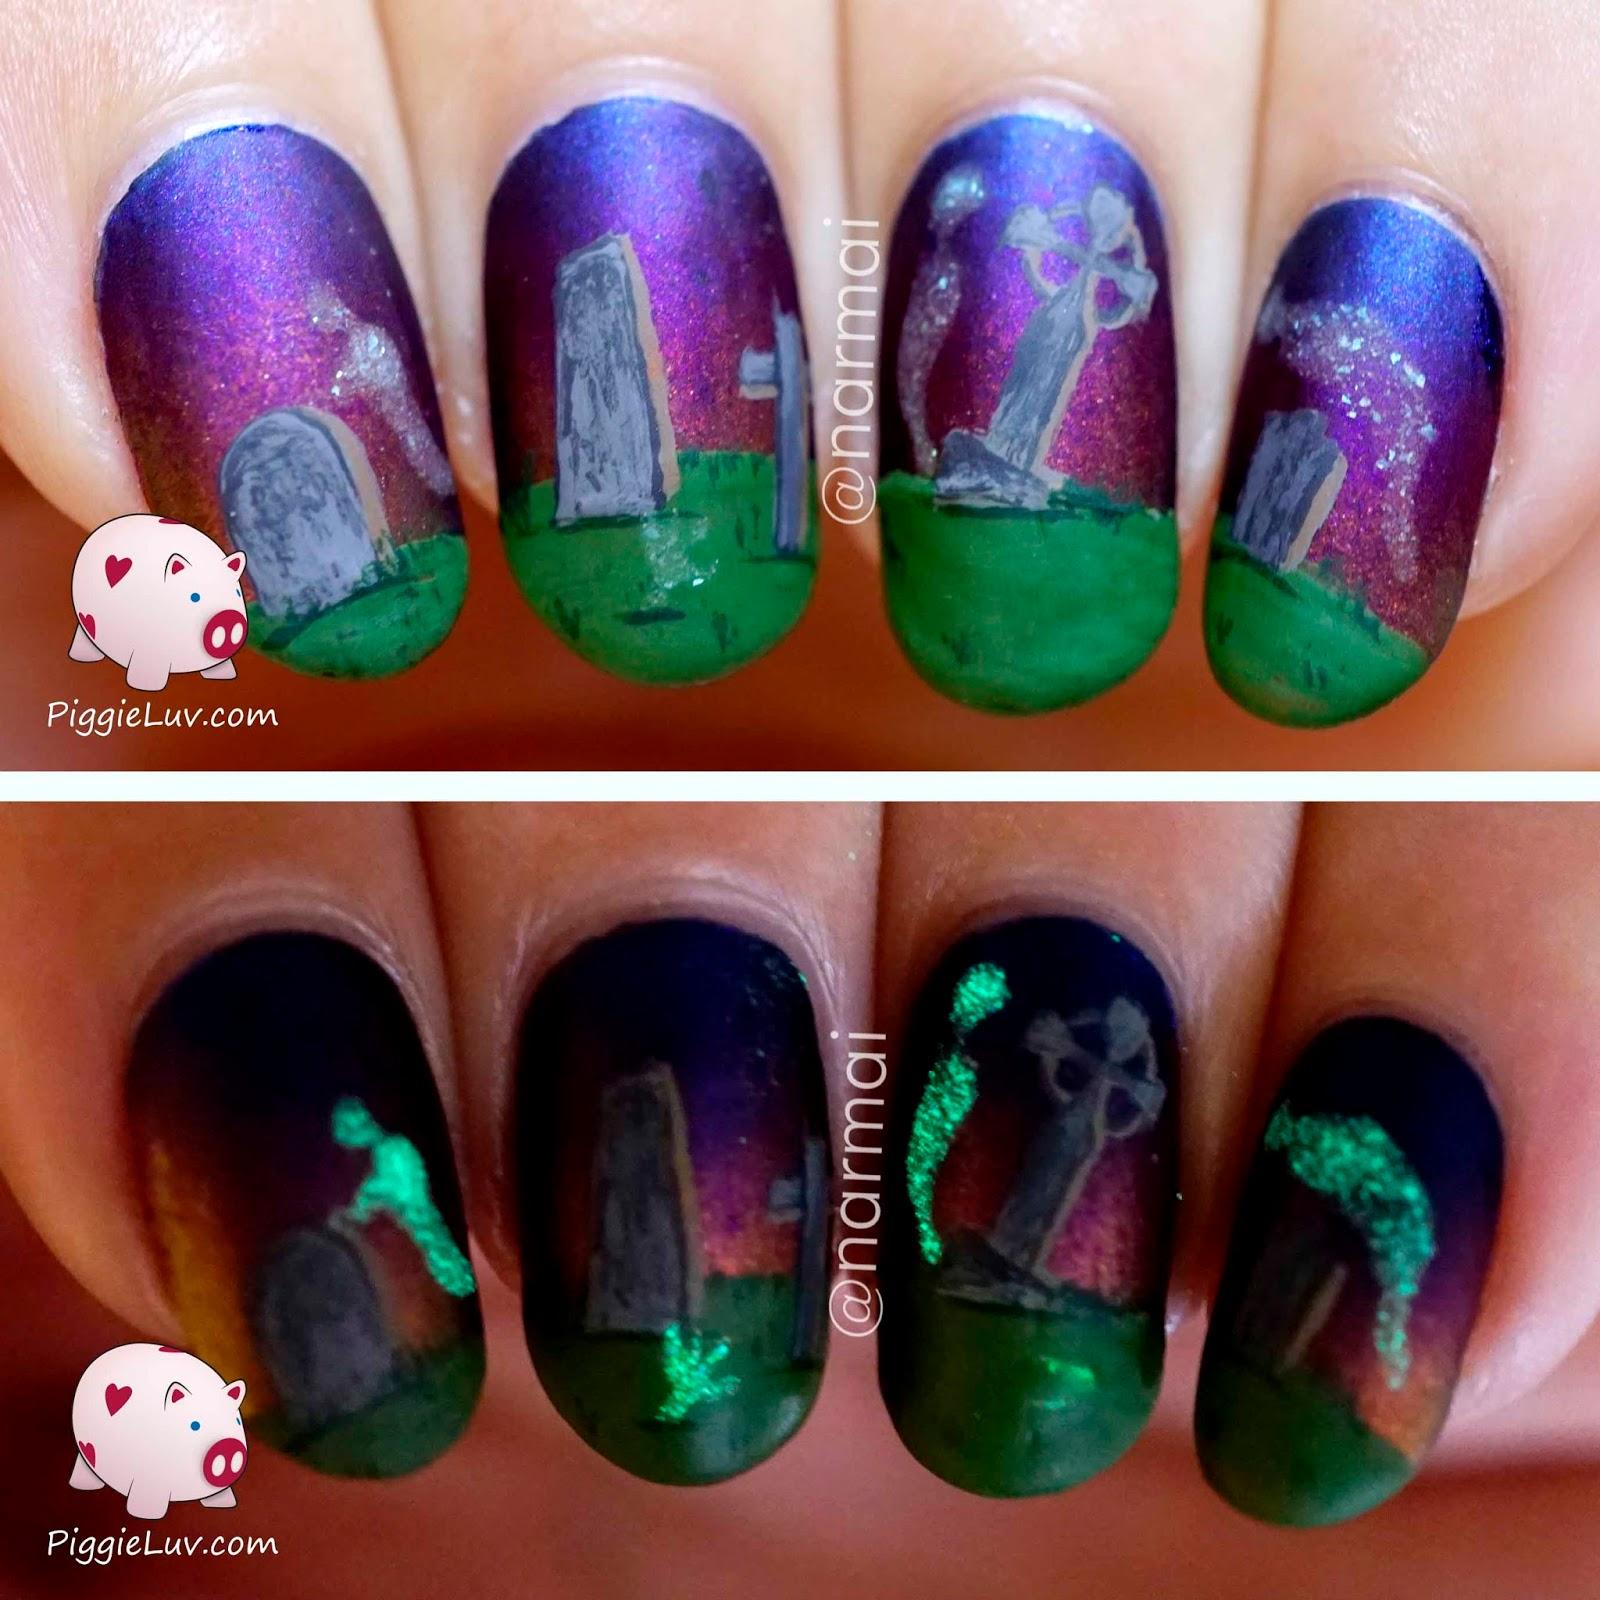 PiggieLuv: Haunted graveyard nail art, glowy ghosts